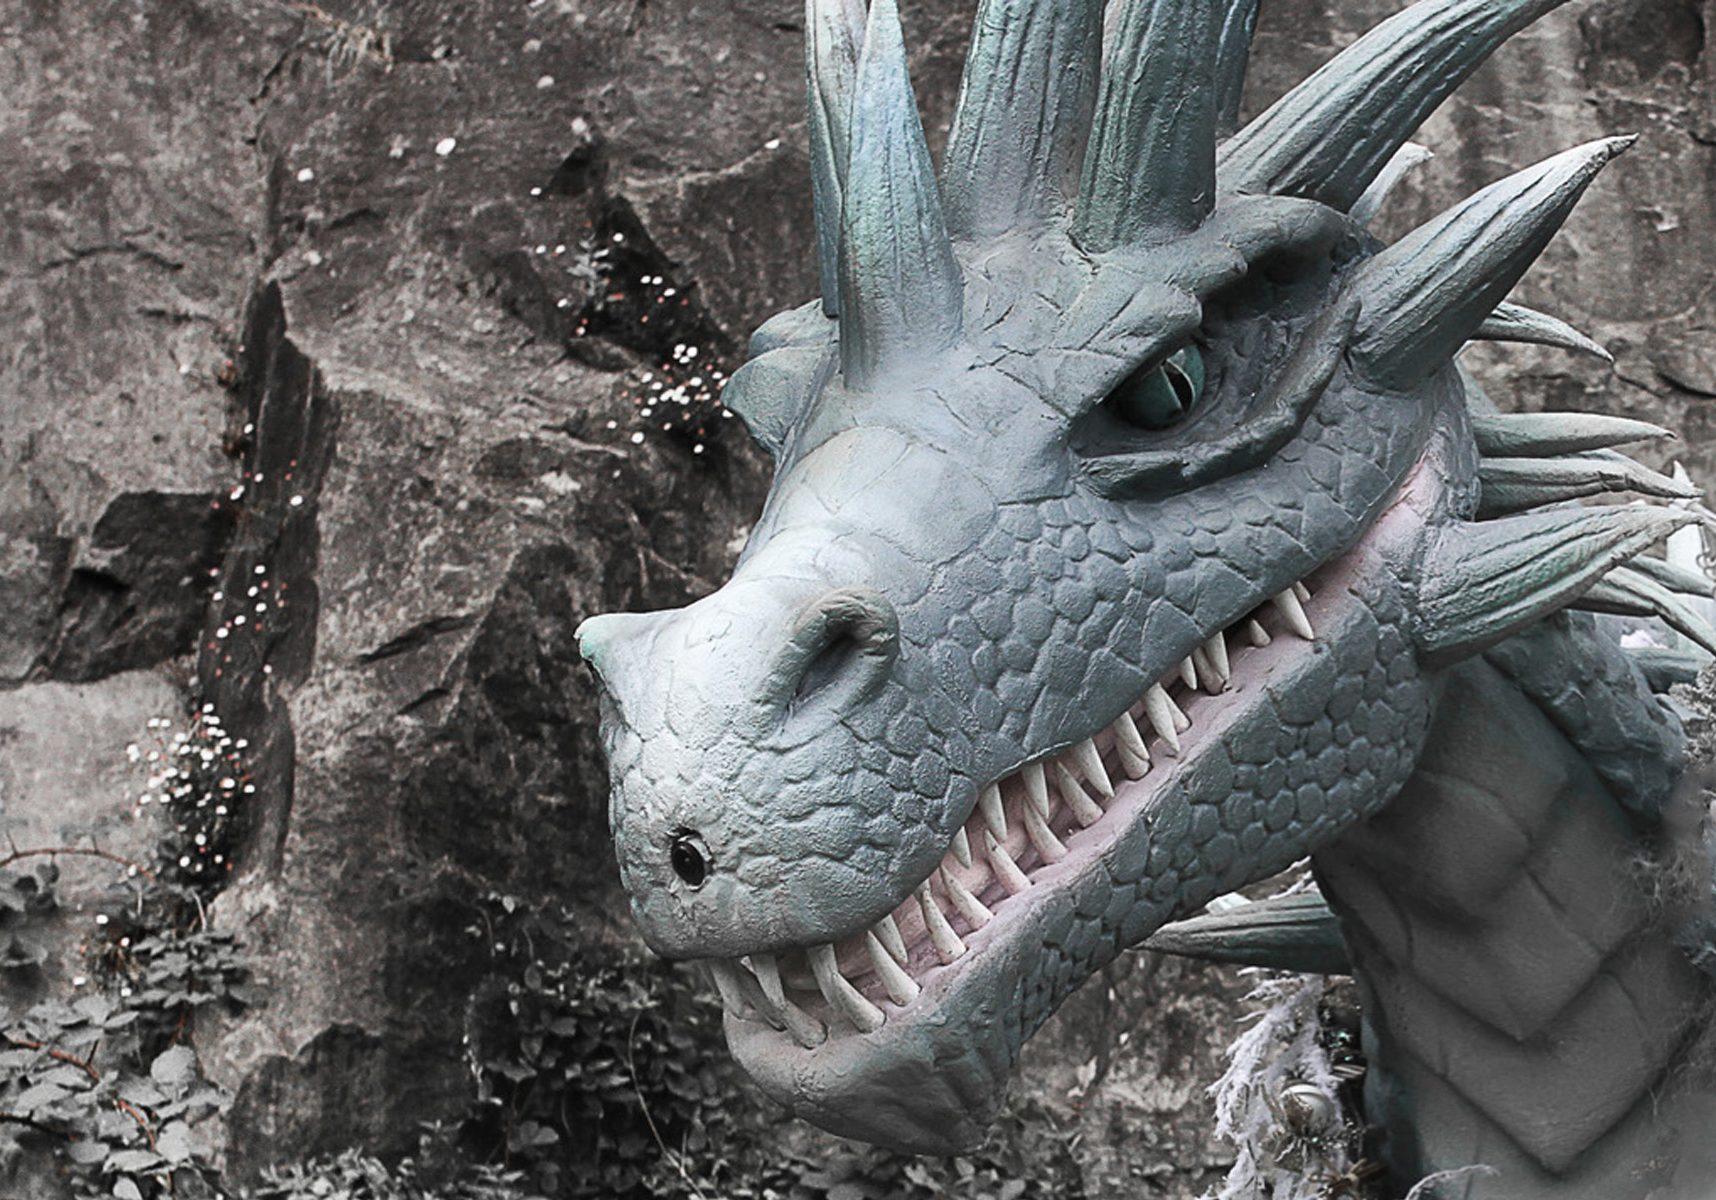 Hire dragon entertainment. Dragon performer for hire. Book a dragon. Hire a dragon.